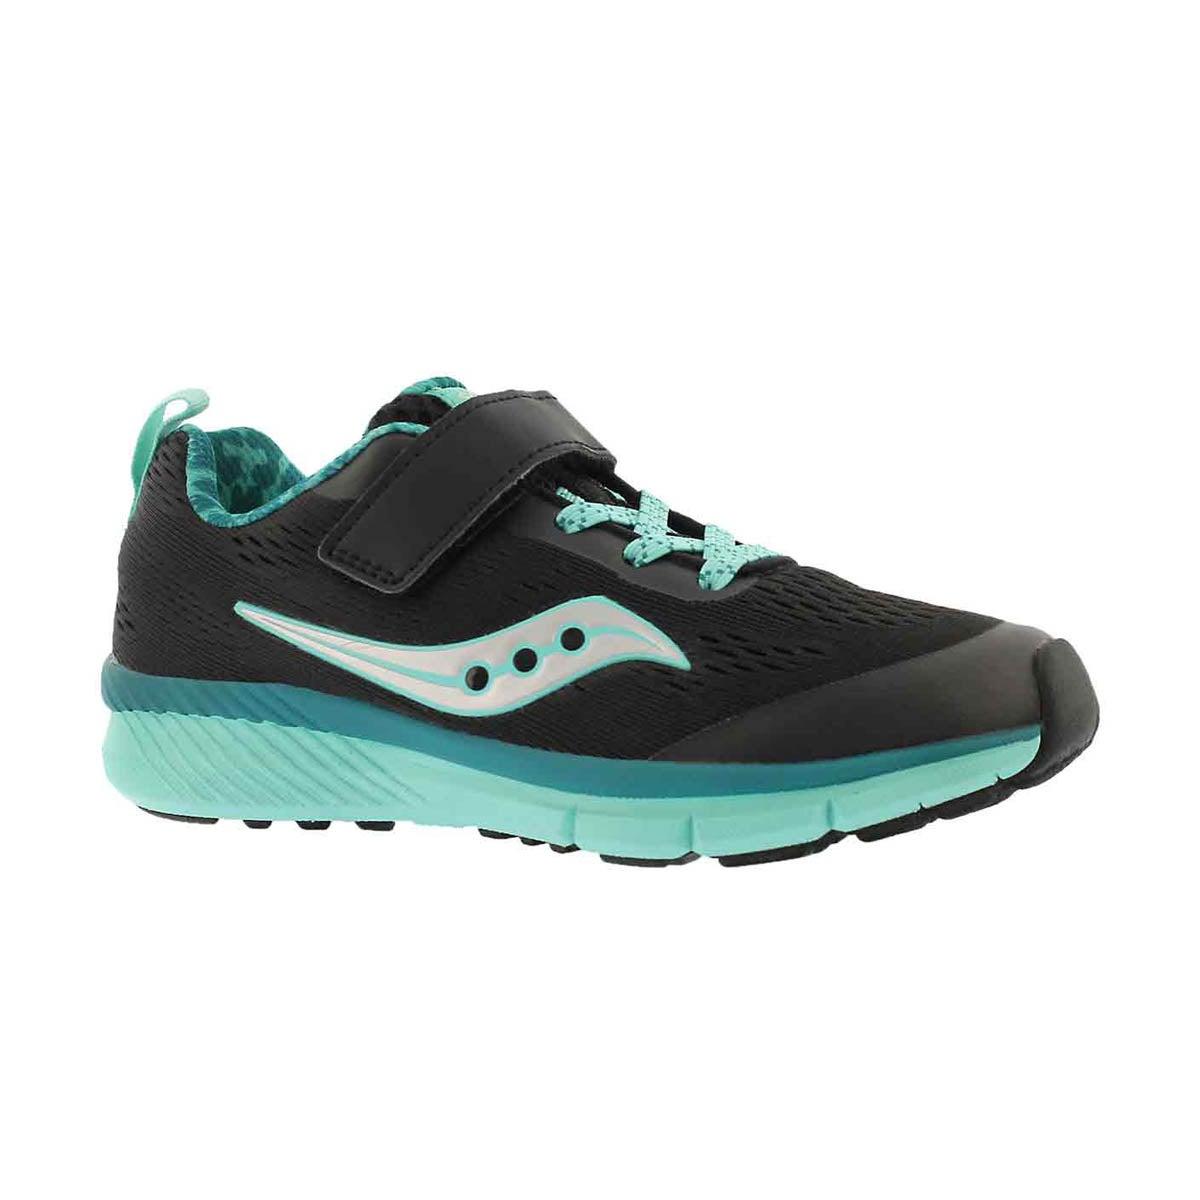 Grls Ideal AC blk/trqs running shoe